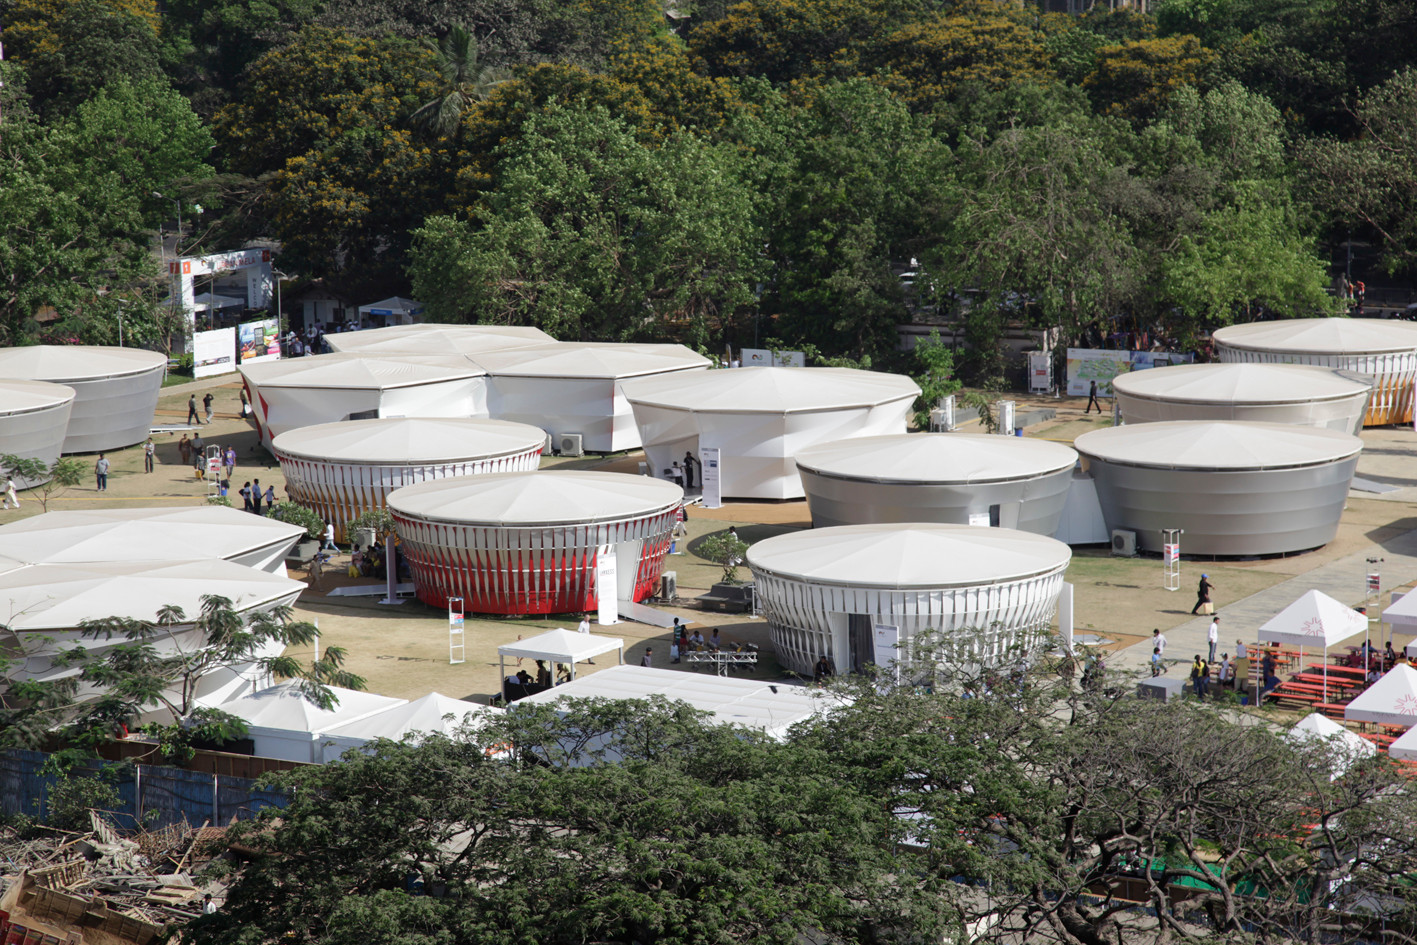 The innovative pavilions designed by renowned German artist Markus Heinsdorff.